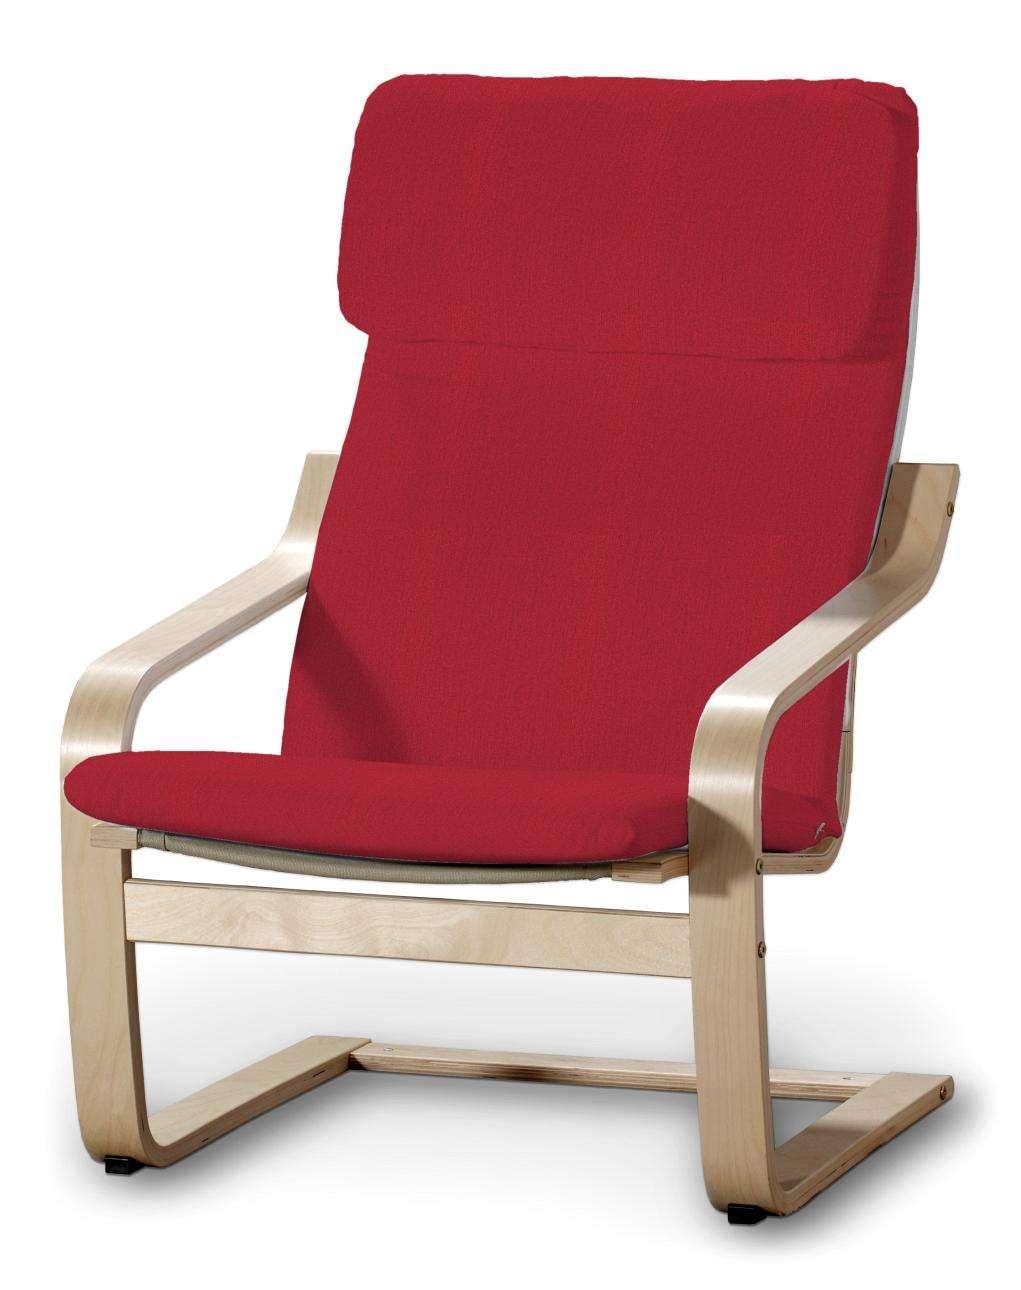 POÄNG  fotelio užvalkalas Poäng armchair kolekcijoje Chenille, audinys: 702-24